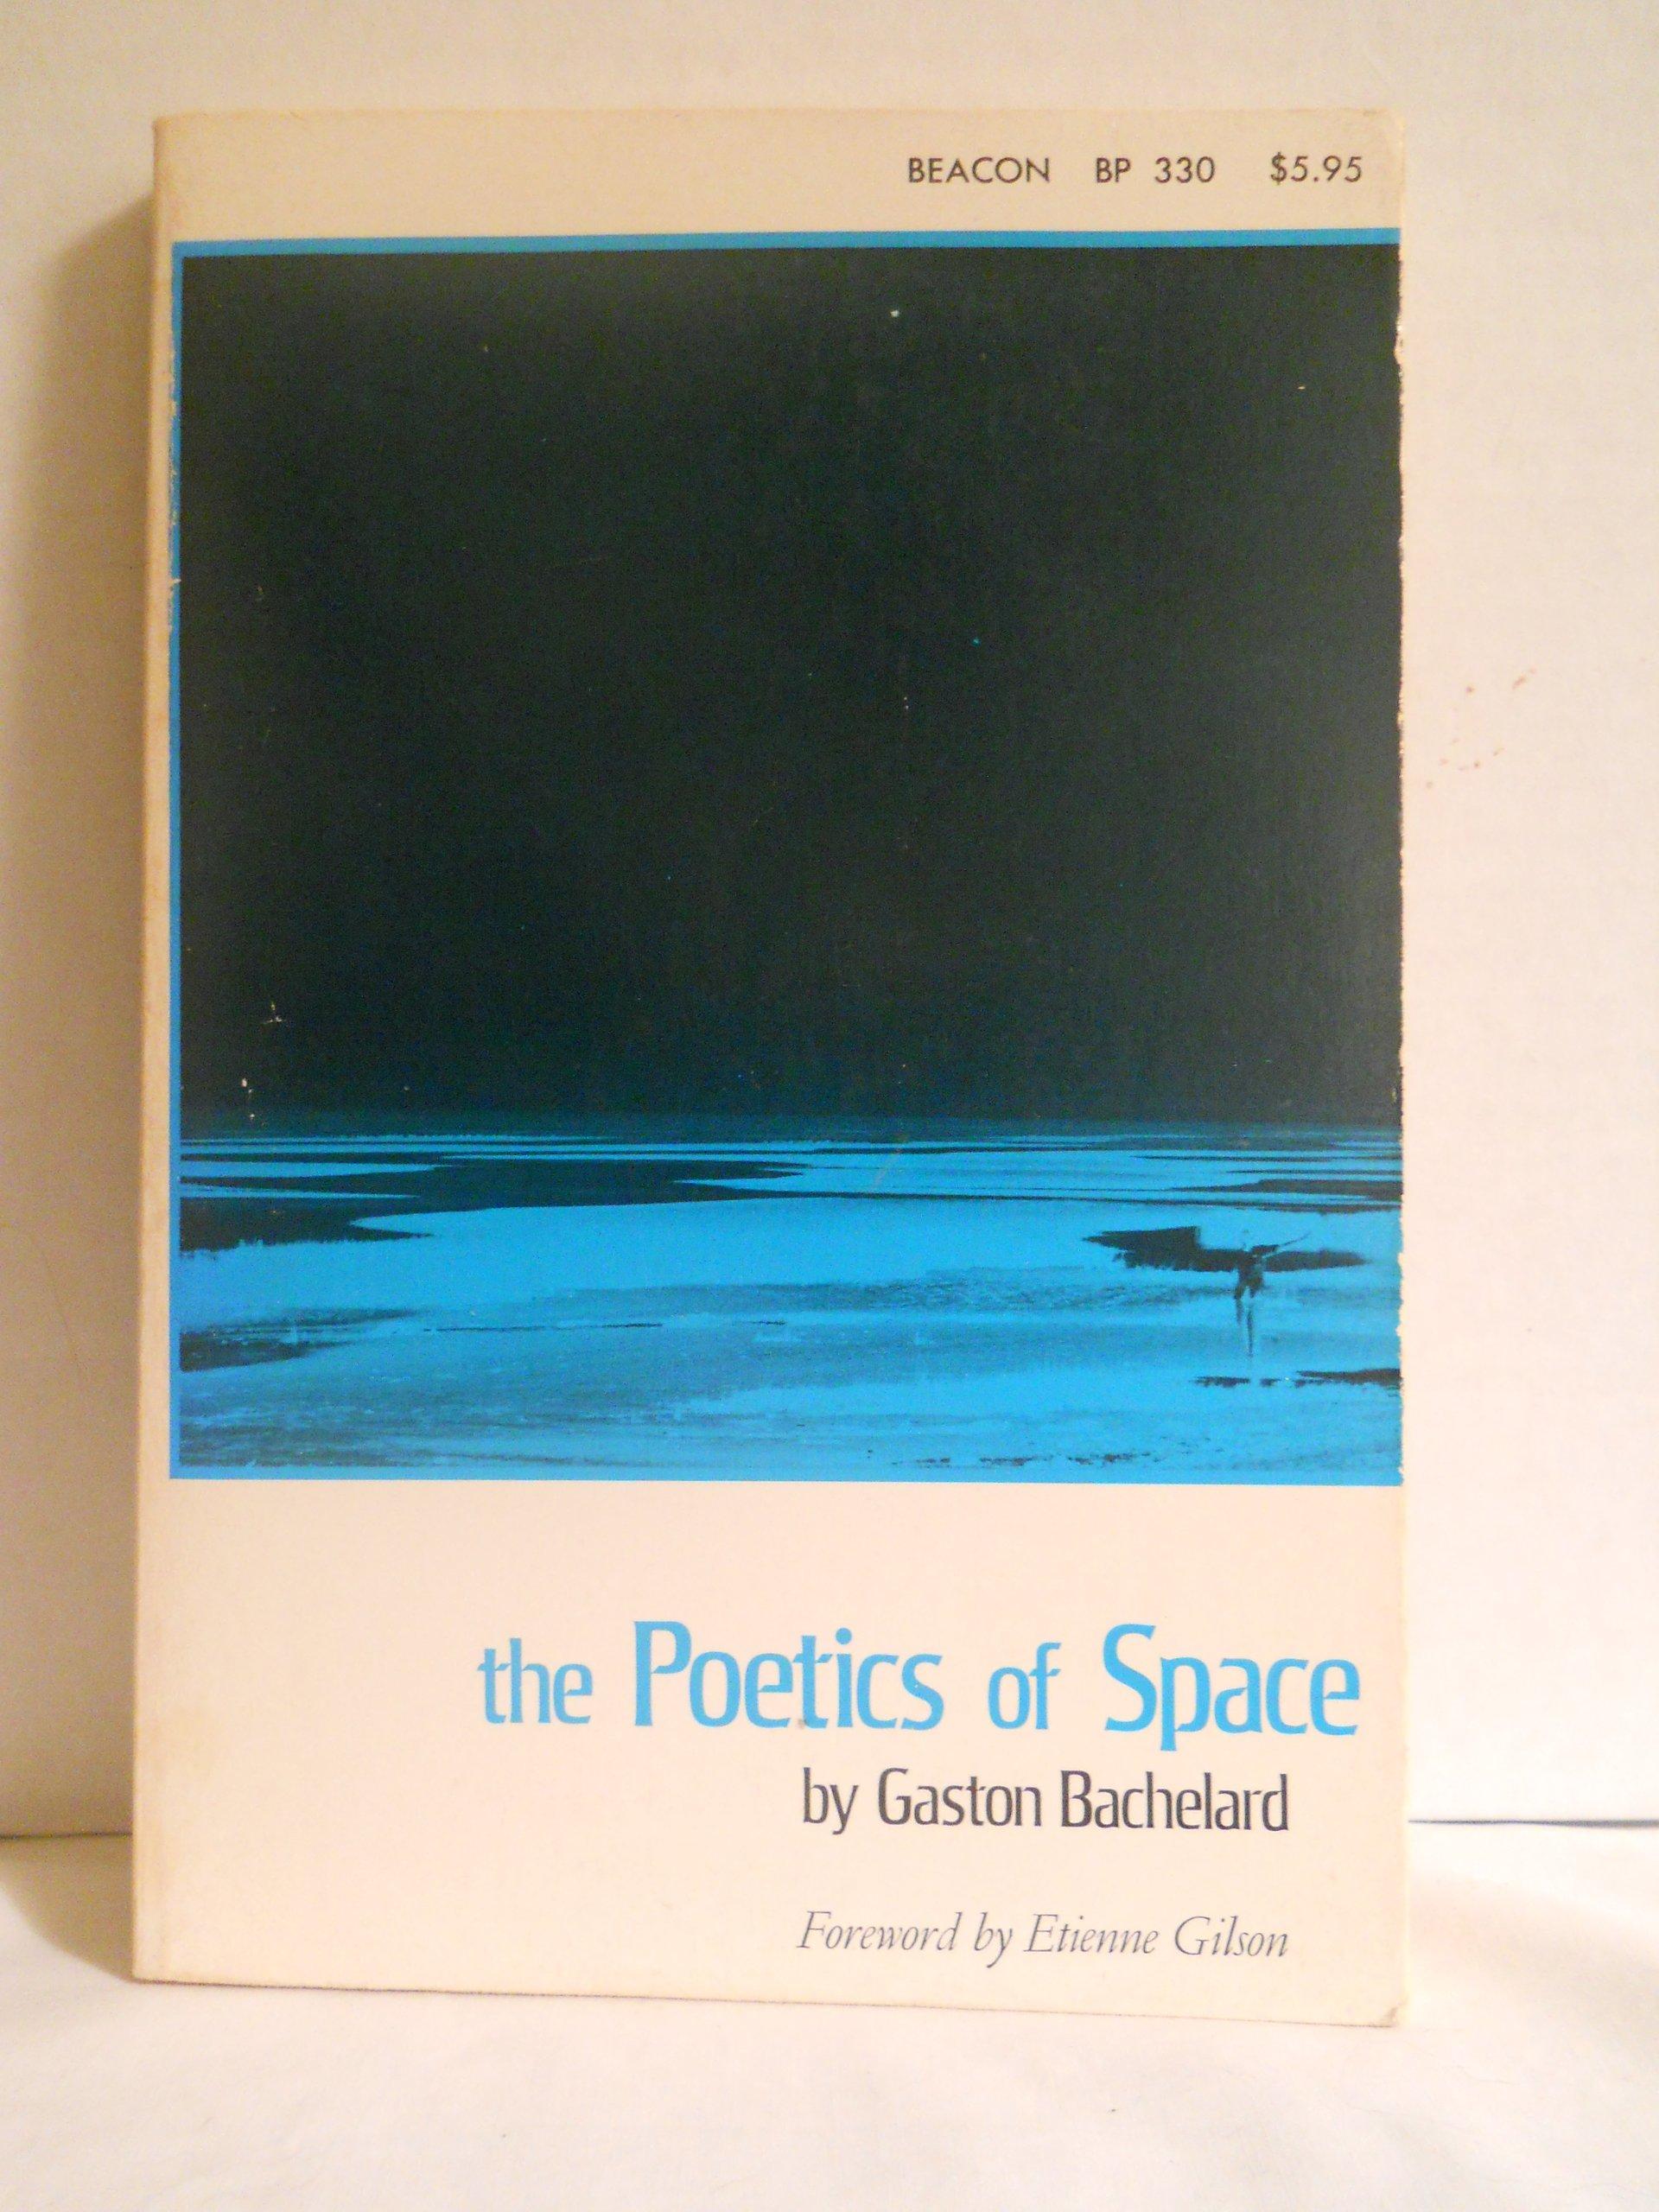 POETICS OF SPACE GASTON BACHELARD EPUB DOWNLOAD